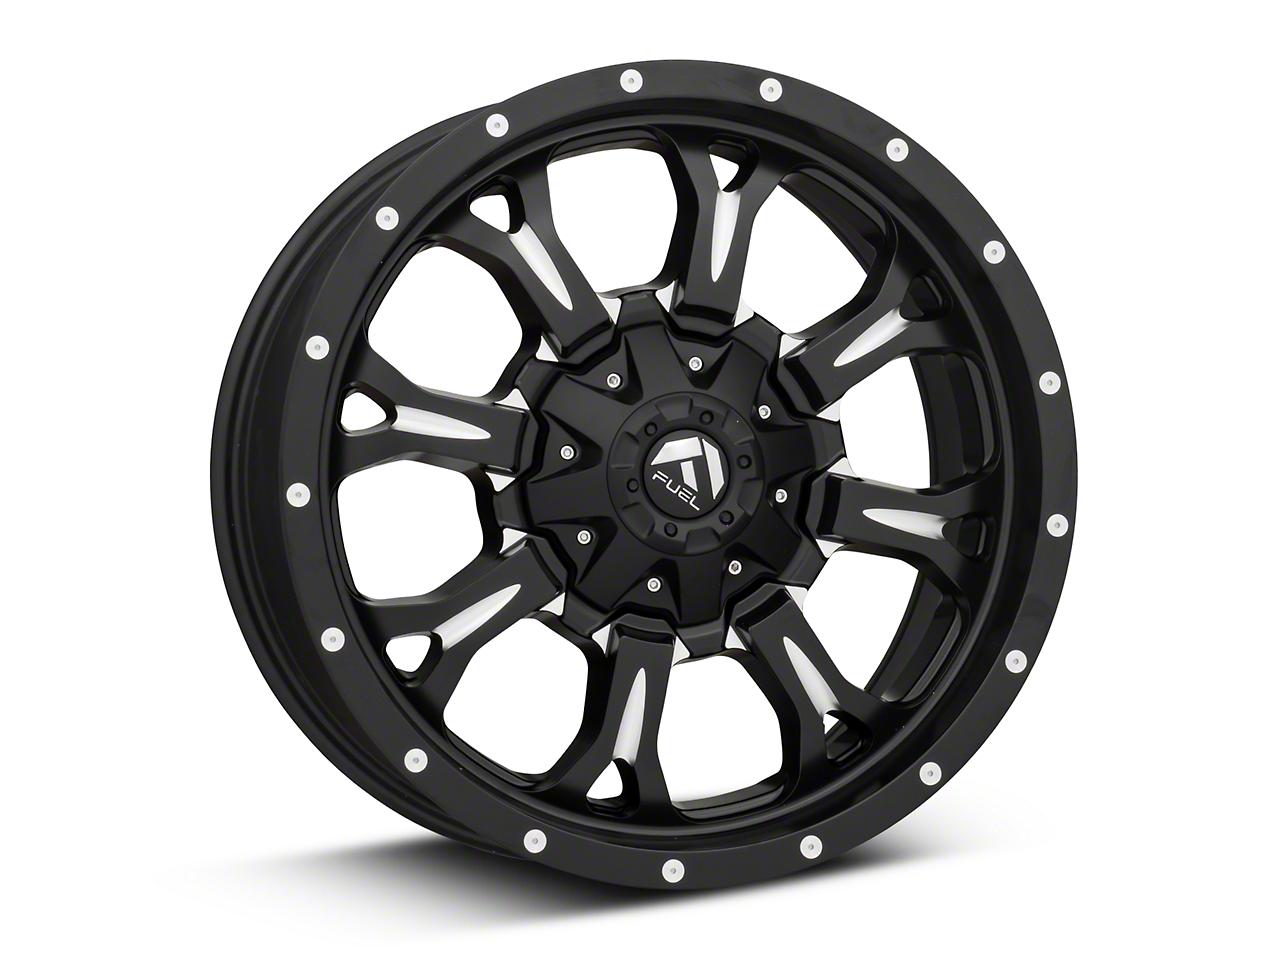 Fuel Wheels Krank Black Milled 6-Lug Wheel - 20x9 (99-18 Silverado 1500)